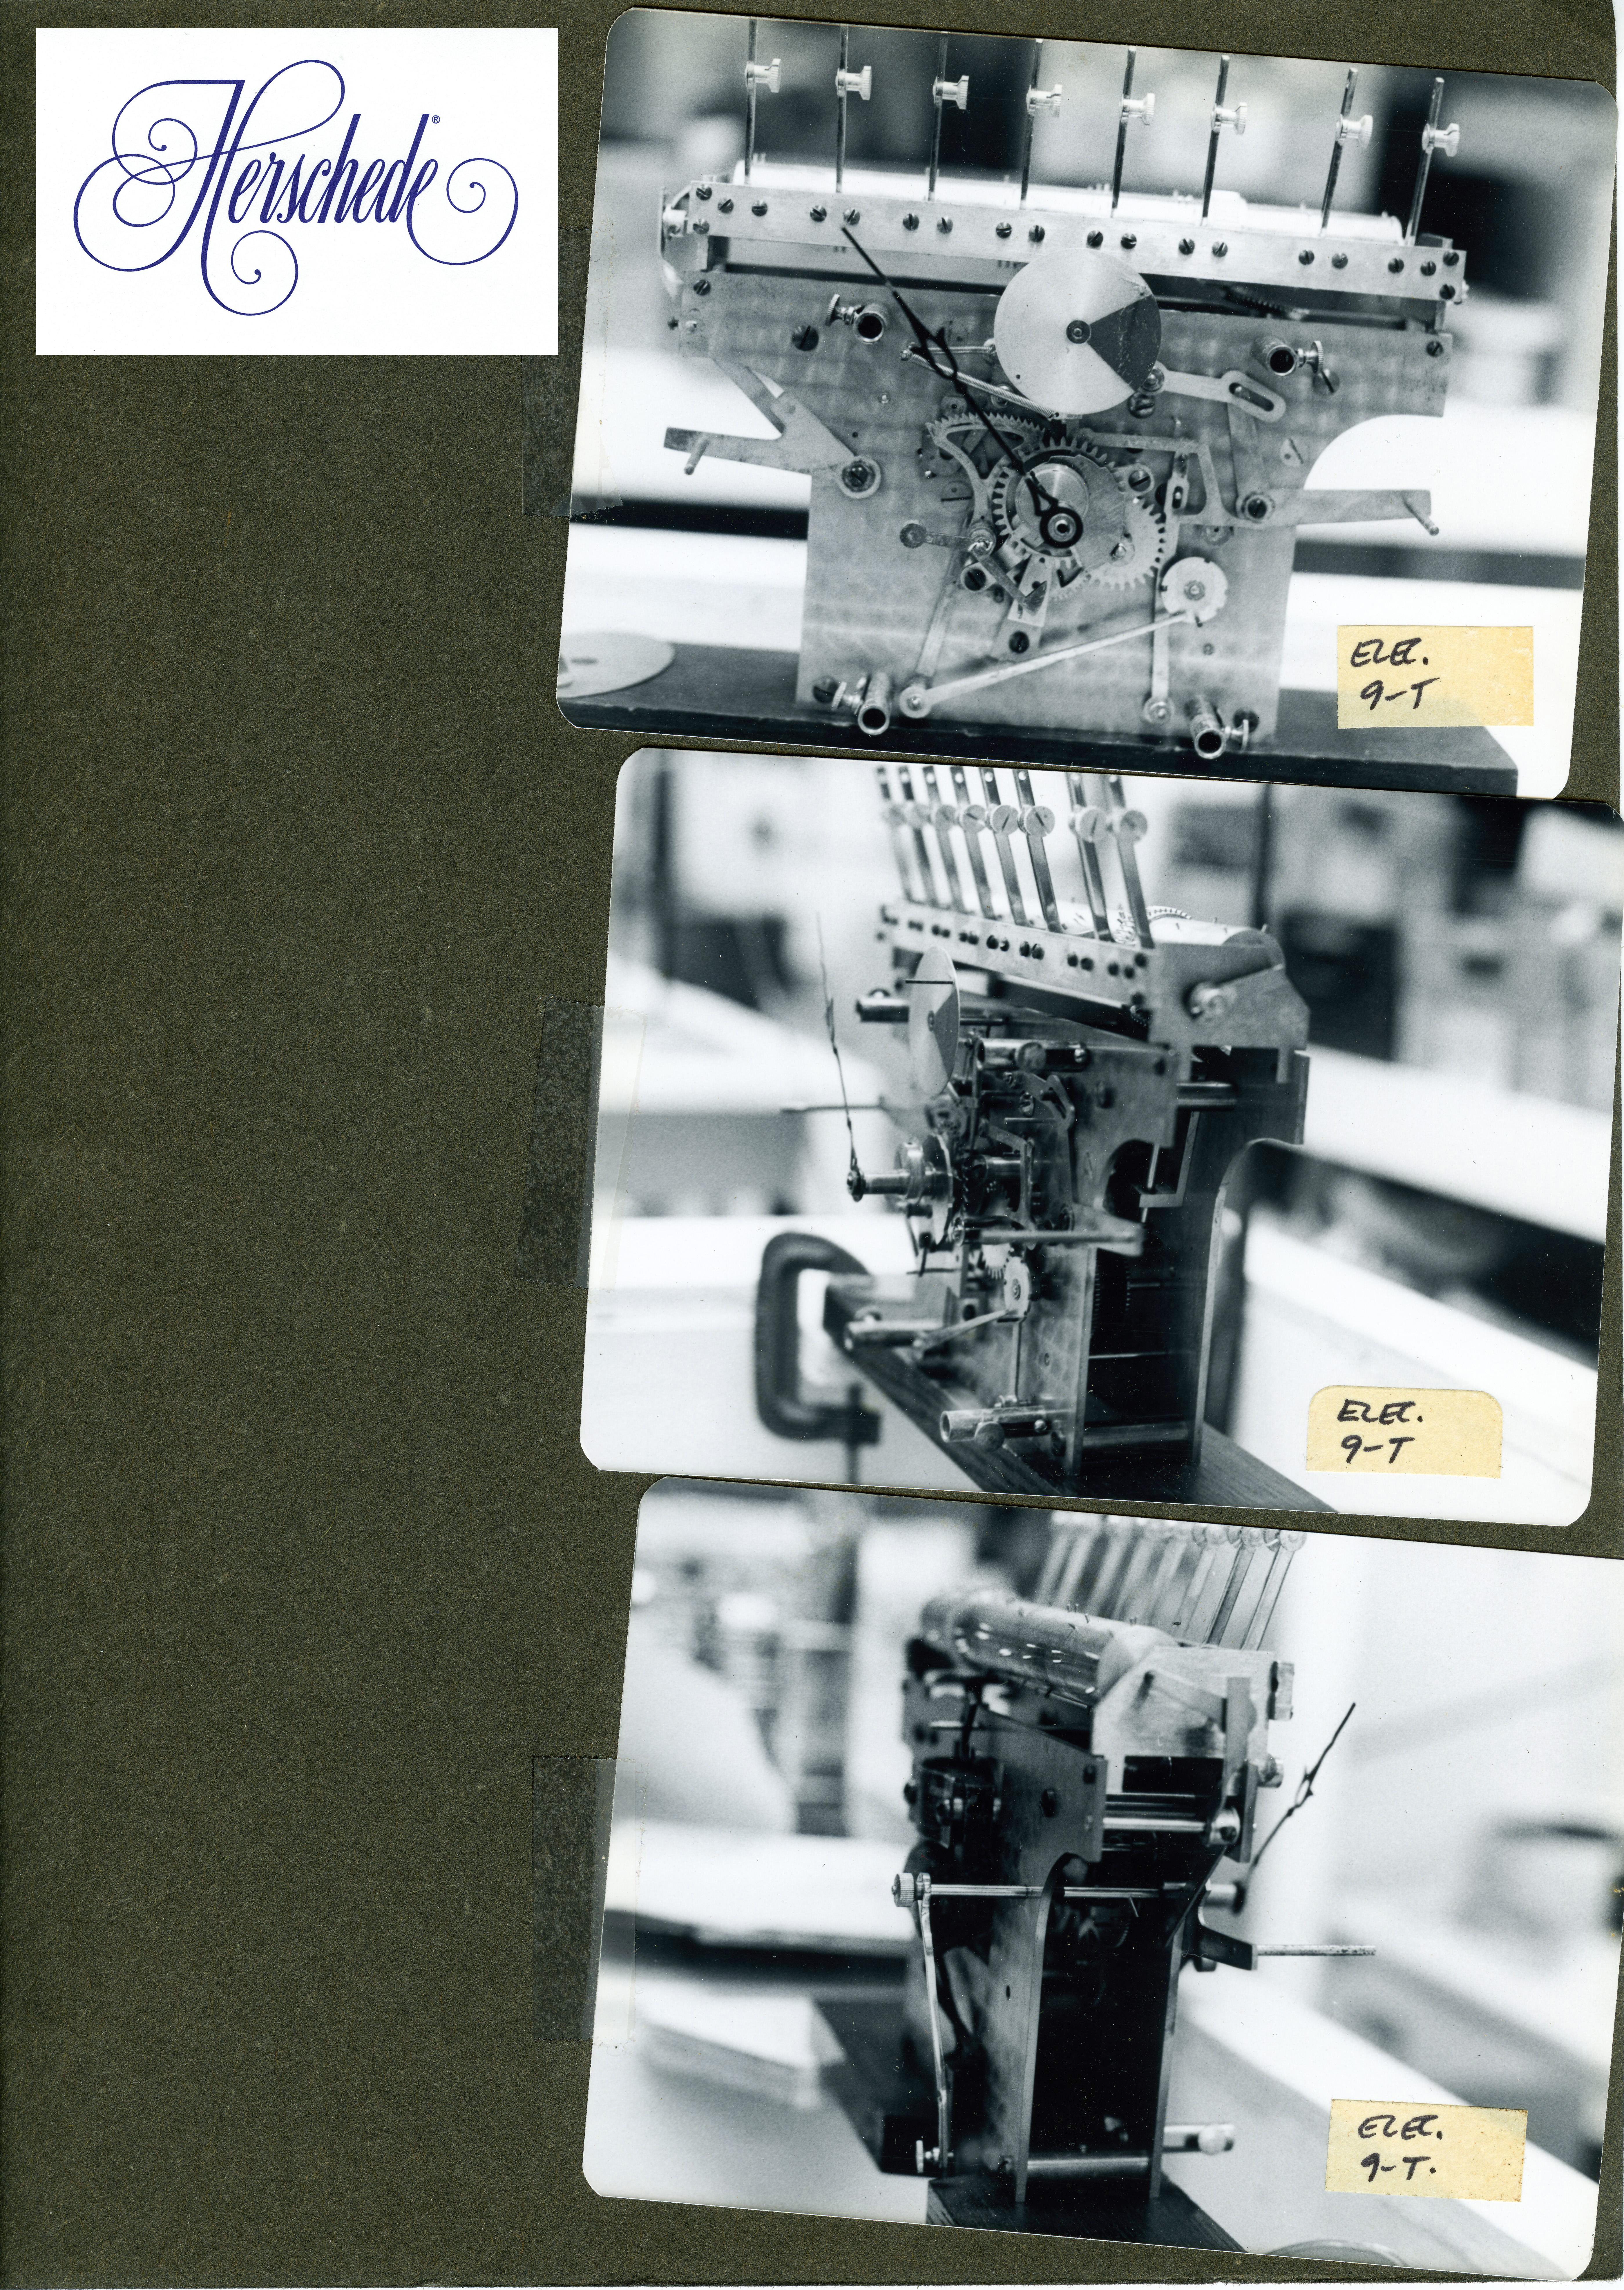 her-9-tube-electric-mov-pics1-web.jpg